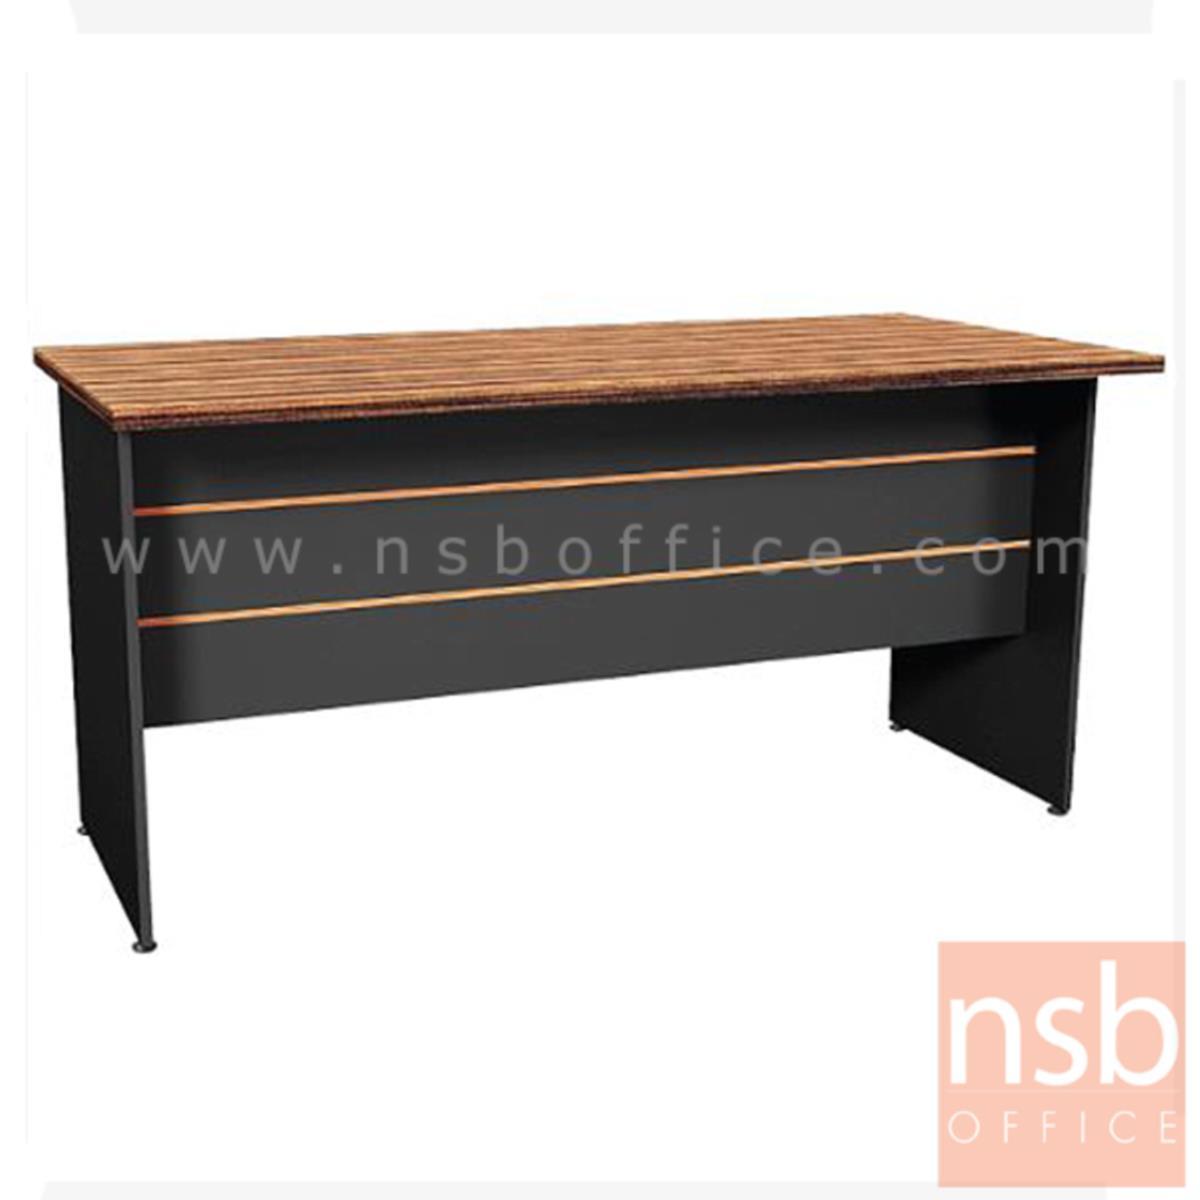 A26A020:โต๊ะทำงาน รุ่น Grenada (เกรนนาดา) ขนาด 160W ,180W cm.  ขาไม้ สีลายไม้ซีบราโน่ตัดดำ ขอบ ROSEGOLD